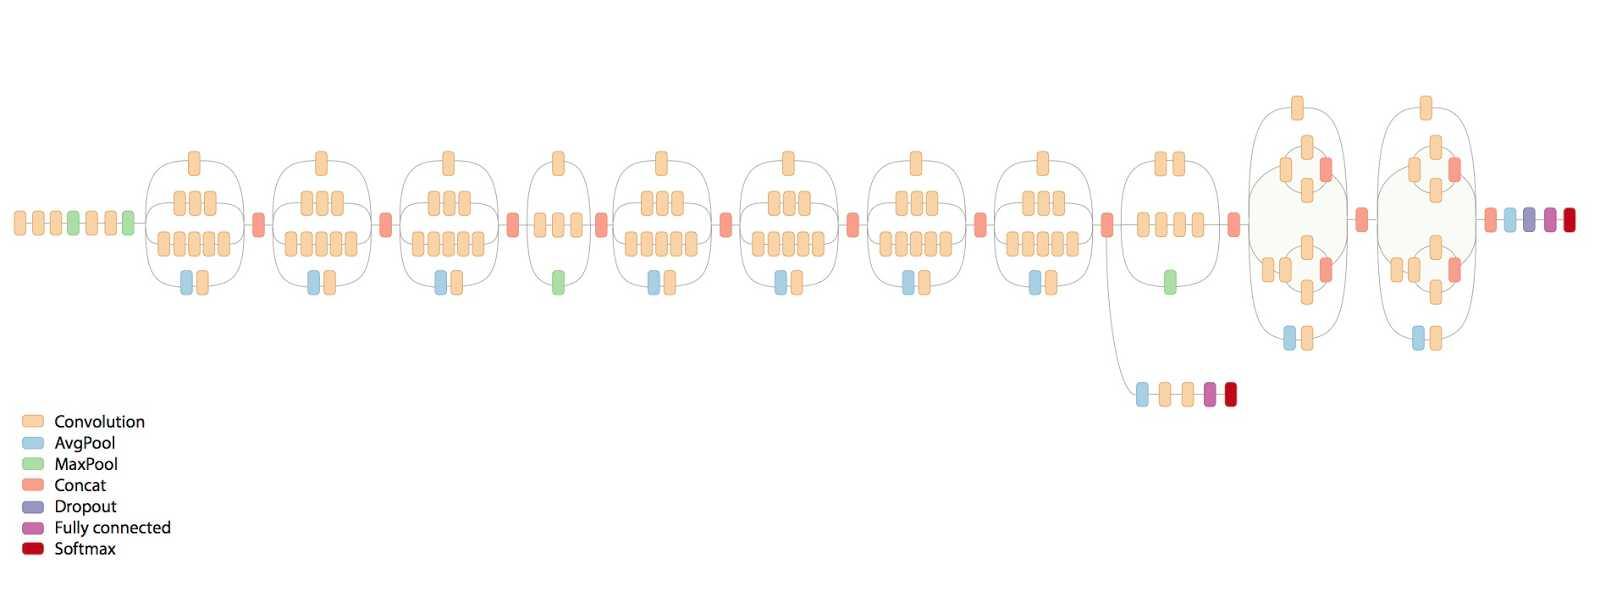 Image Classifier